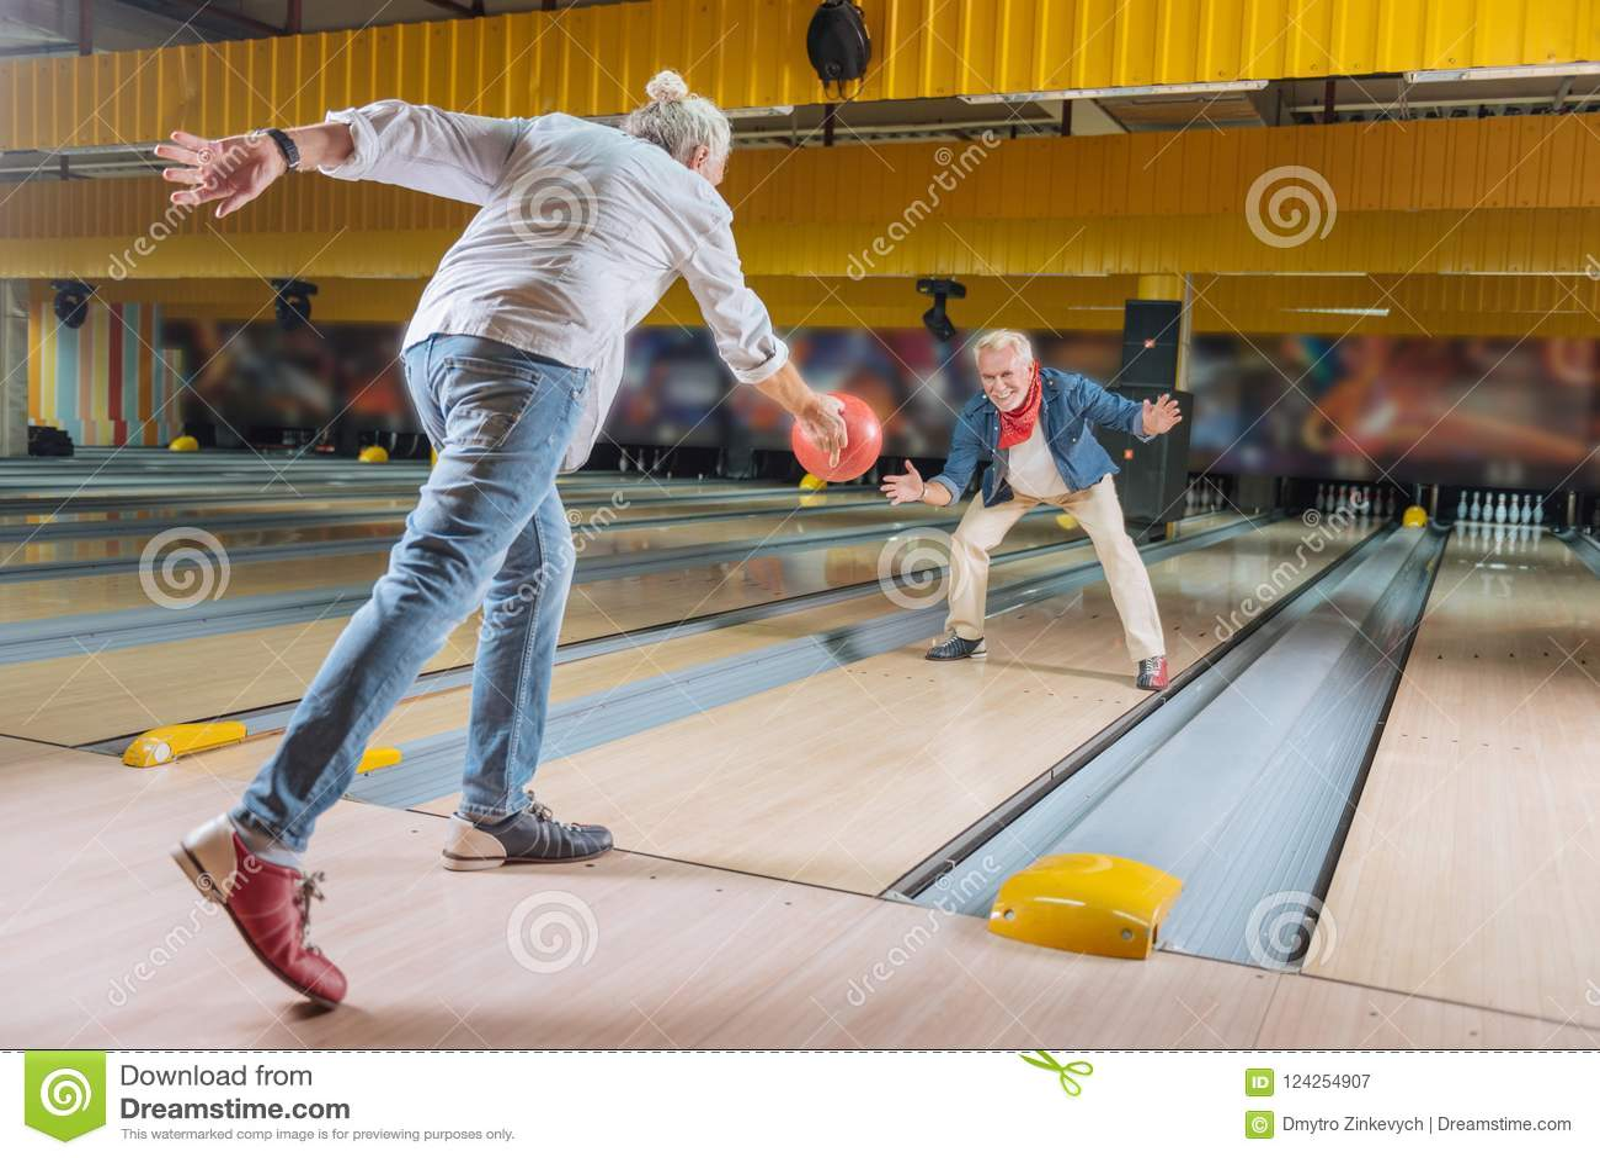 Delighted nice elderly men having fun together